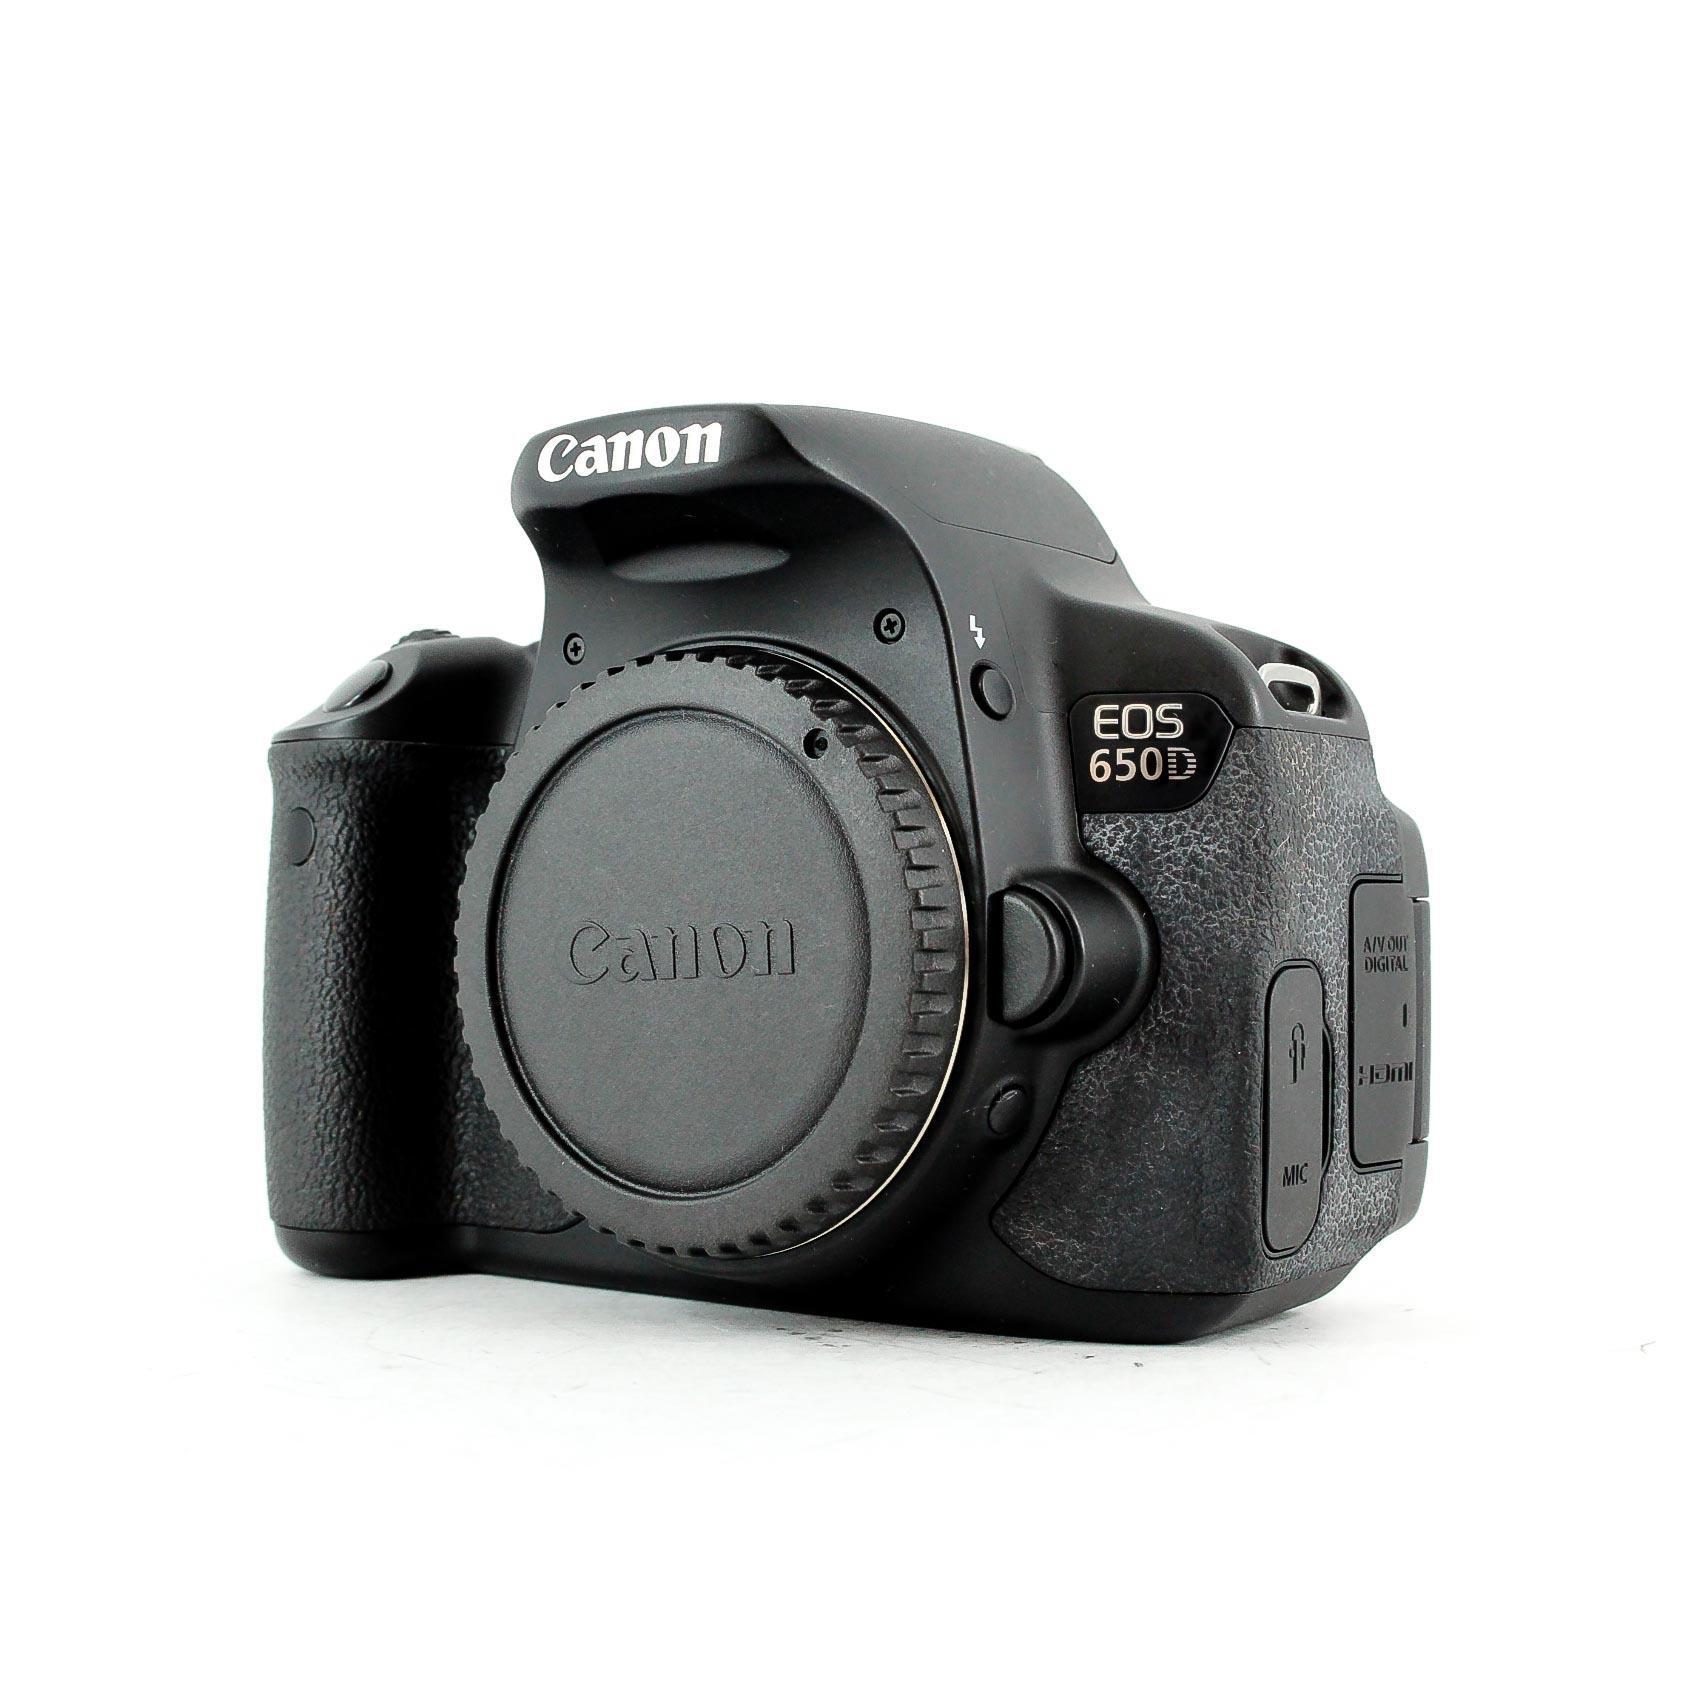 Reflex - Canon EOS 650D Boitier nu - Noir